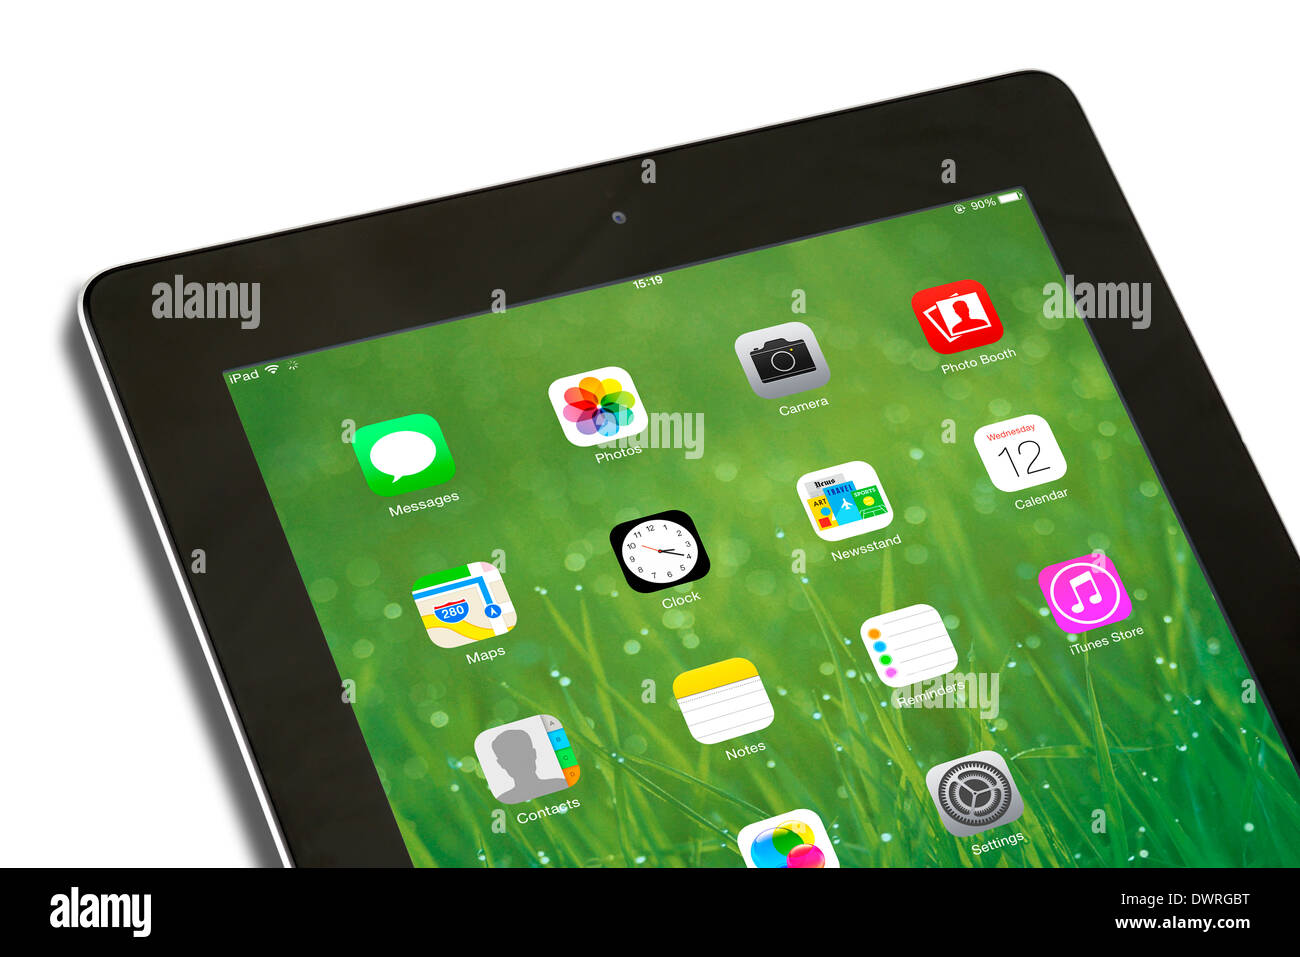 IOS 7.1 écran d'accueil sur un Apple iPad 4e génération retina display tablet computer Photo Stock